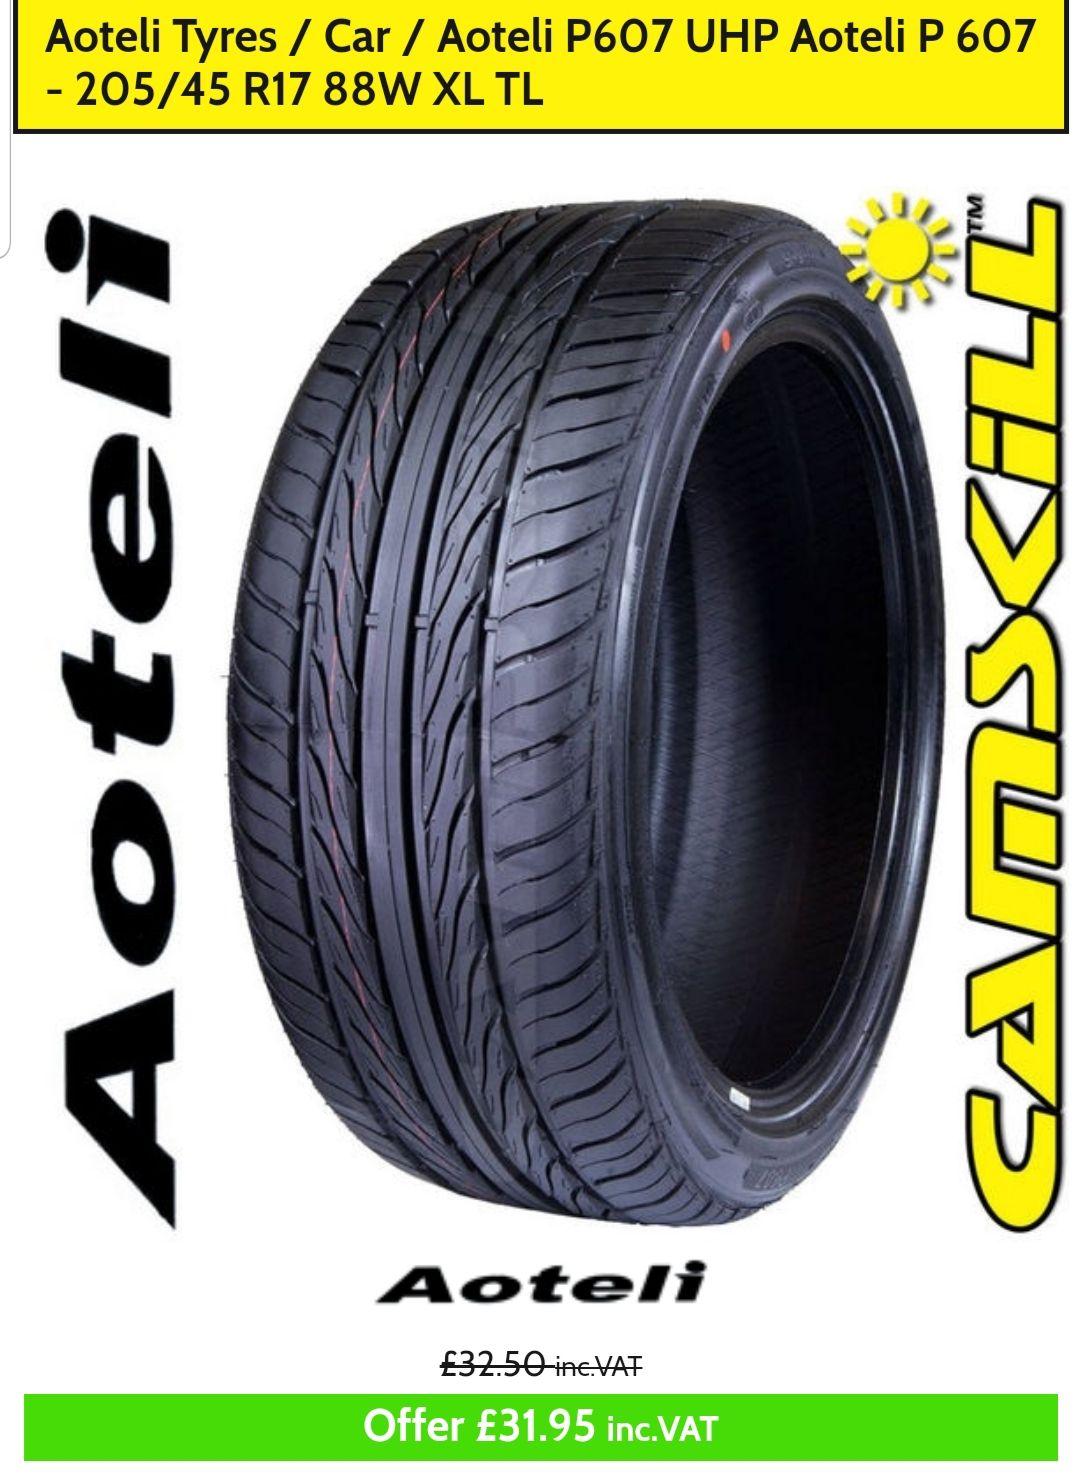 bdb31f5ffd7 Aoteli P607 Tyres - £31.95   CamSkill Performance